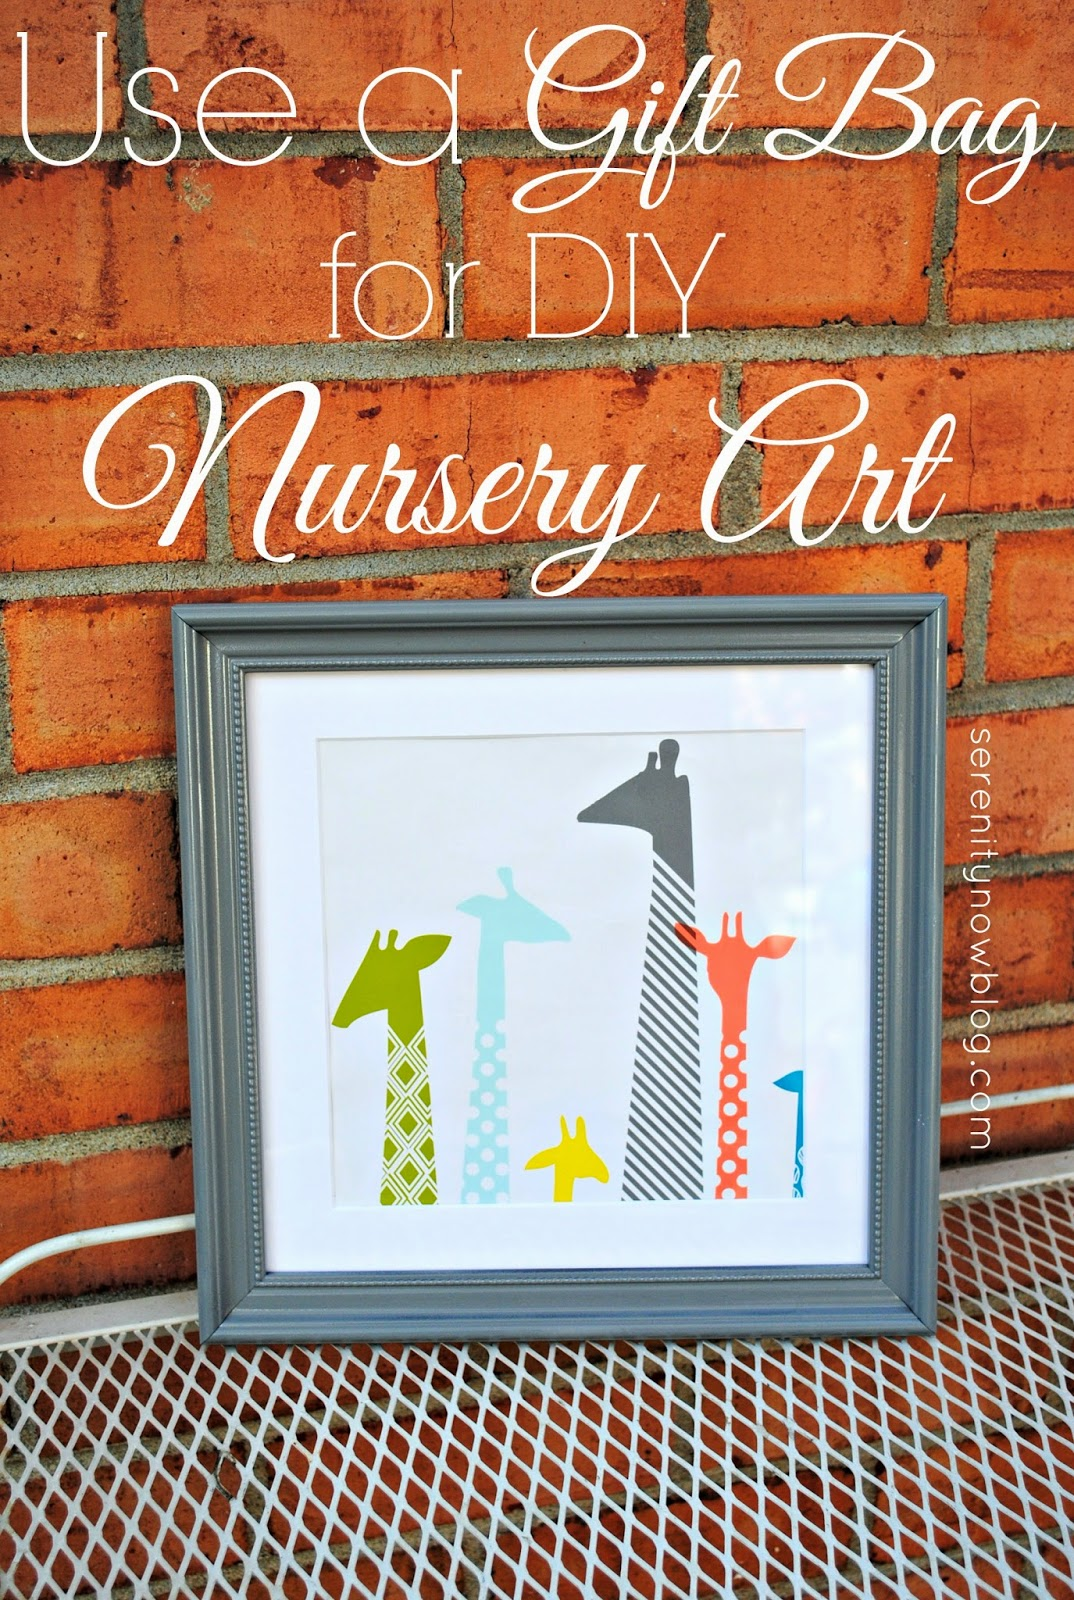 Diy Wall Art For Nursery : Serenity now nursery wall art from a gift bag free diy